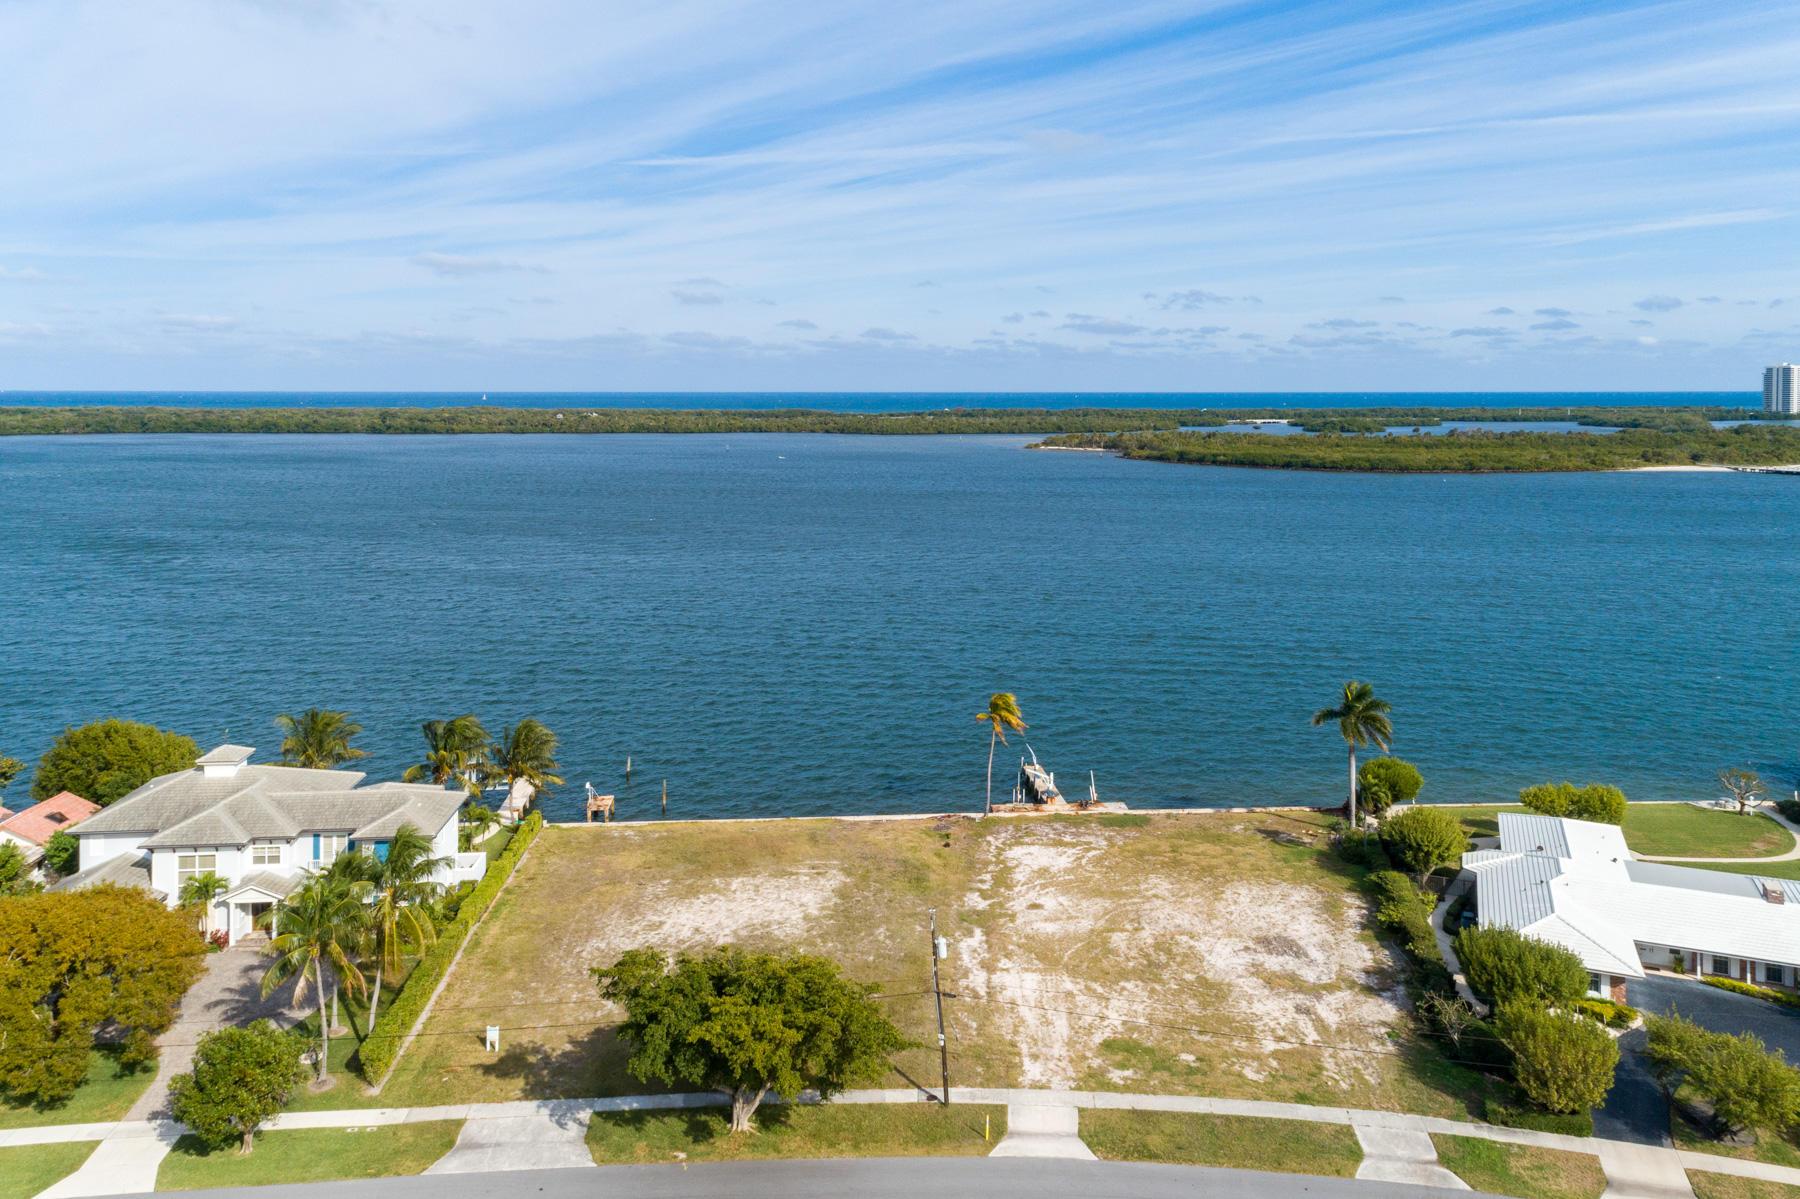 730 Lakeside Drive, North Palm Beach, Florida 33408, ,C,Single family,Lakeside,RX-10499518